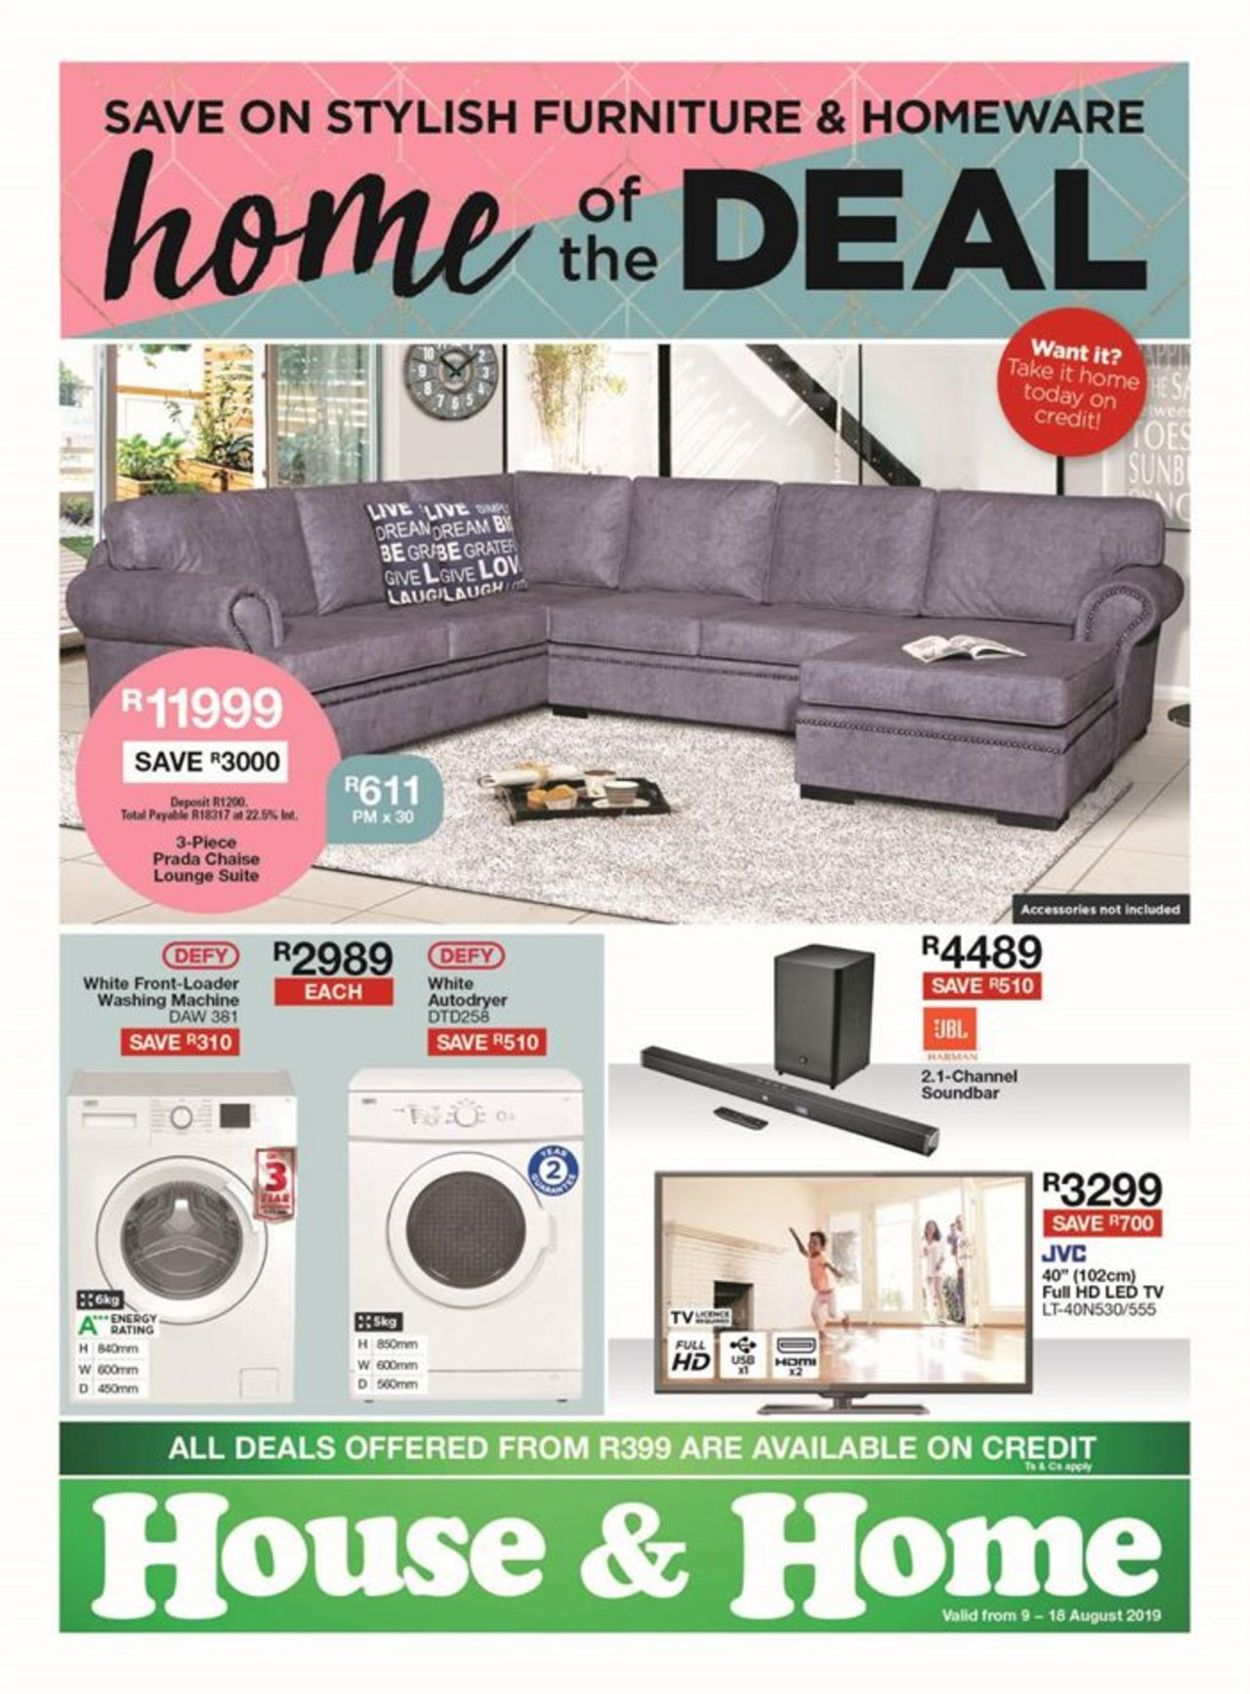 House & Home Catalogue - 2019/08/12-2019/08/18